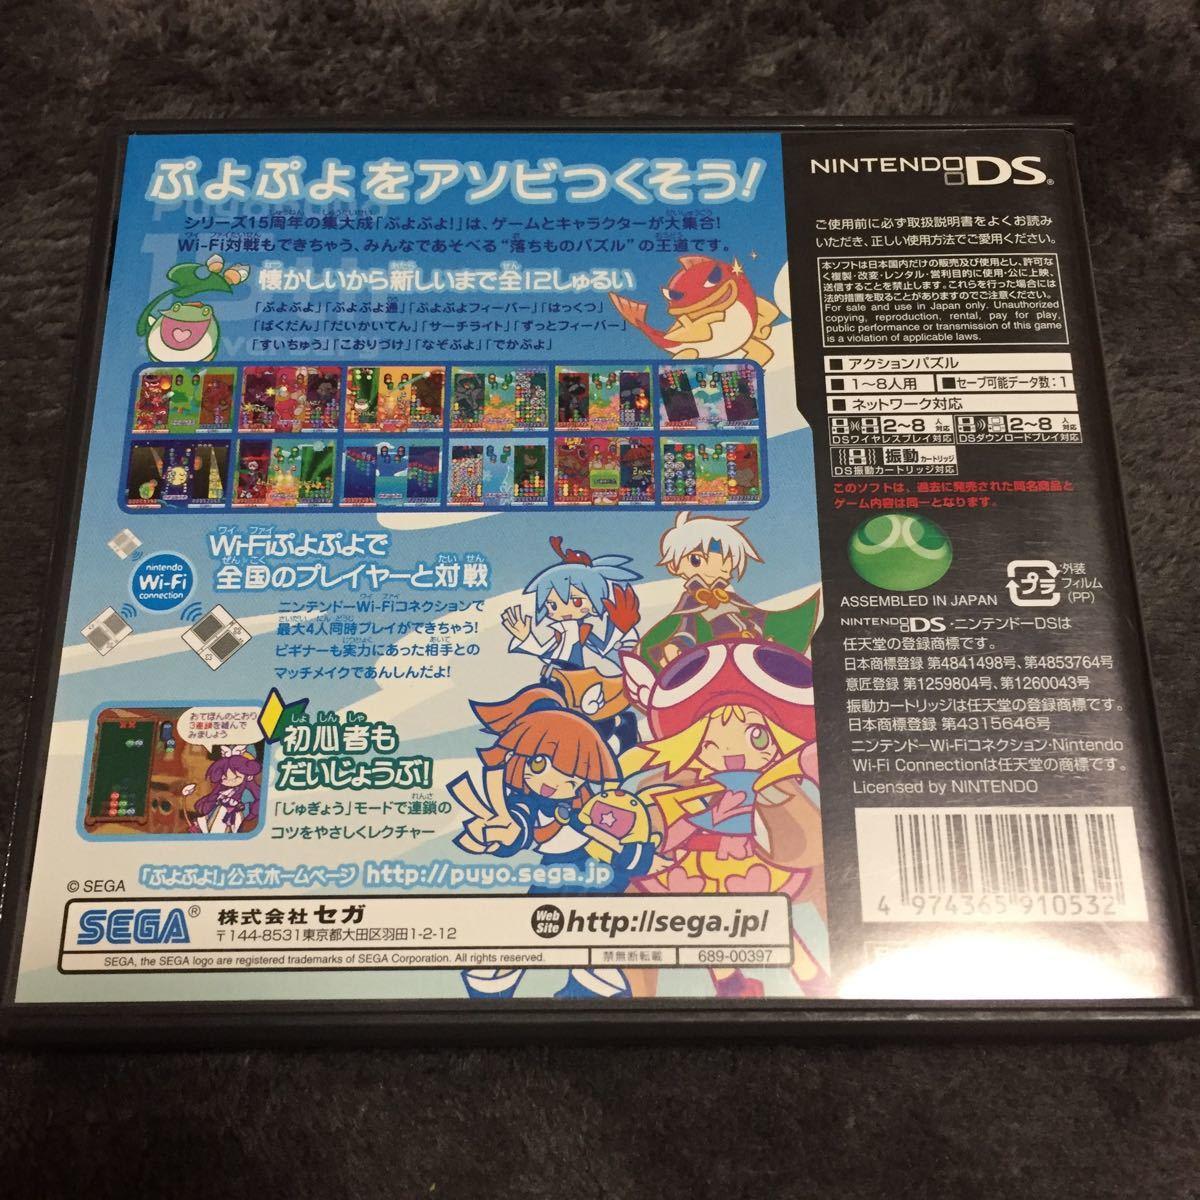 DSソフト ぷよぷよ ニンテンドーDS 任天堂 NINTENDO DS